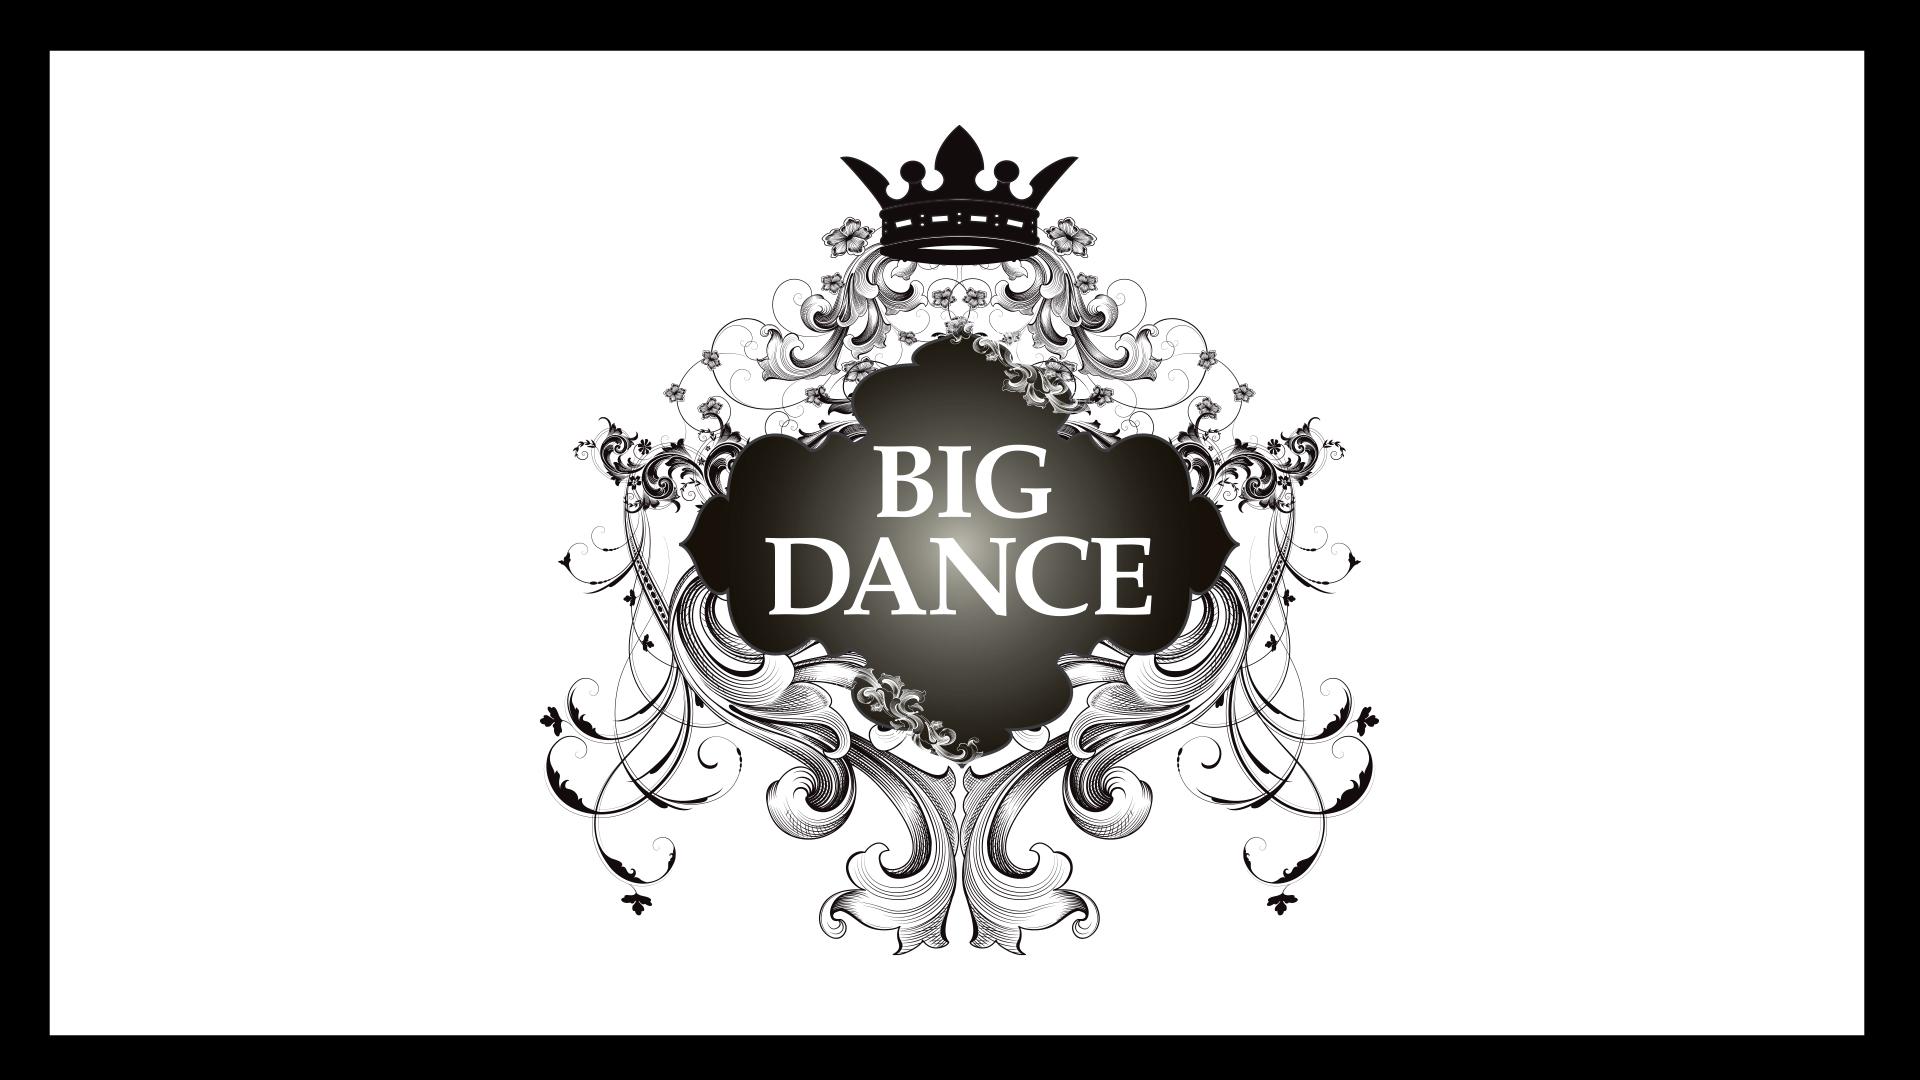 Pole Fitness - Big Dance